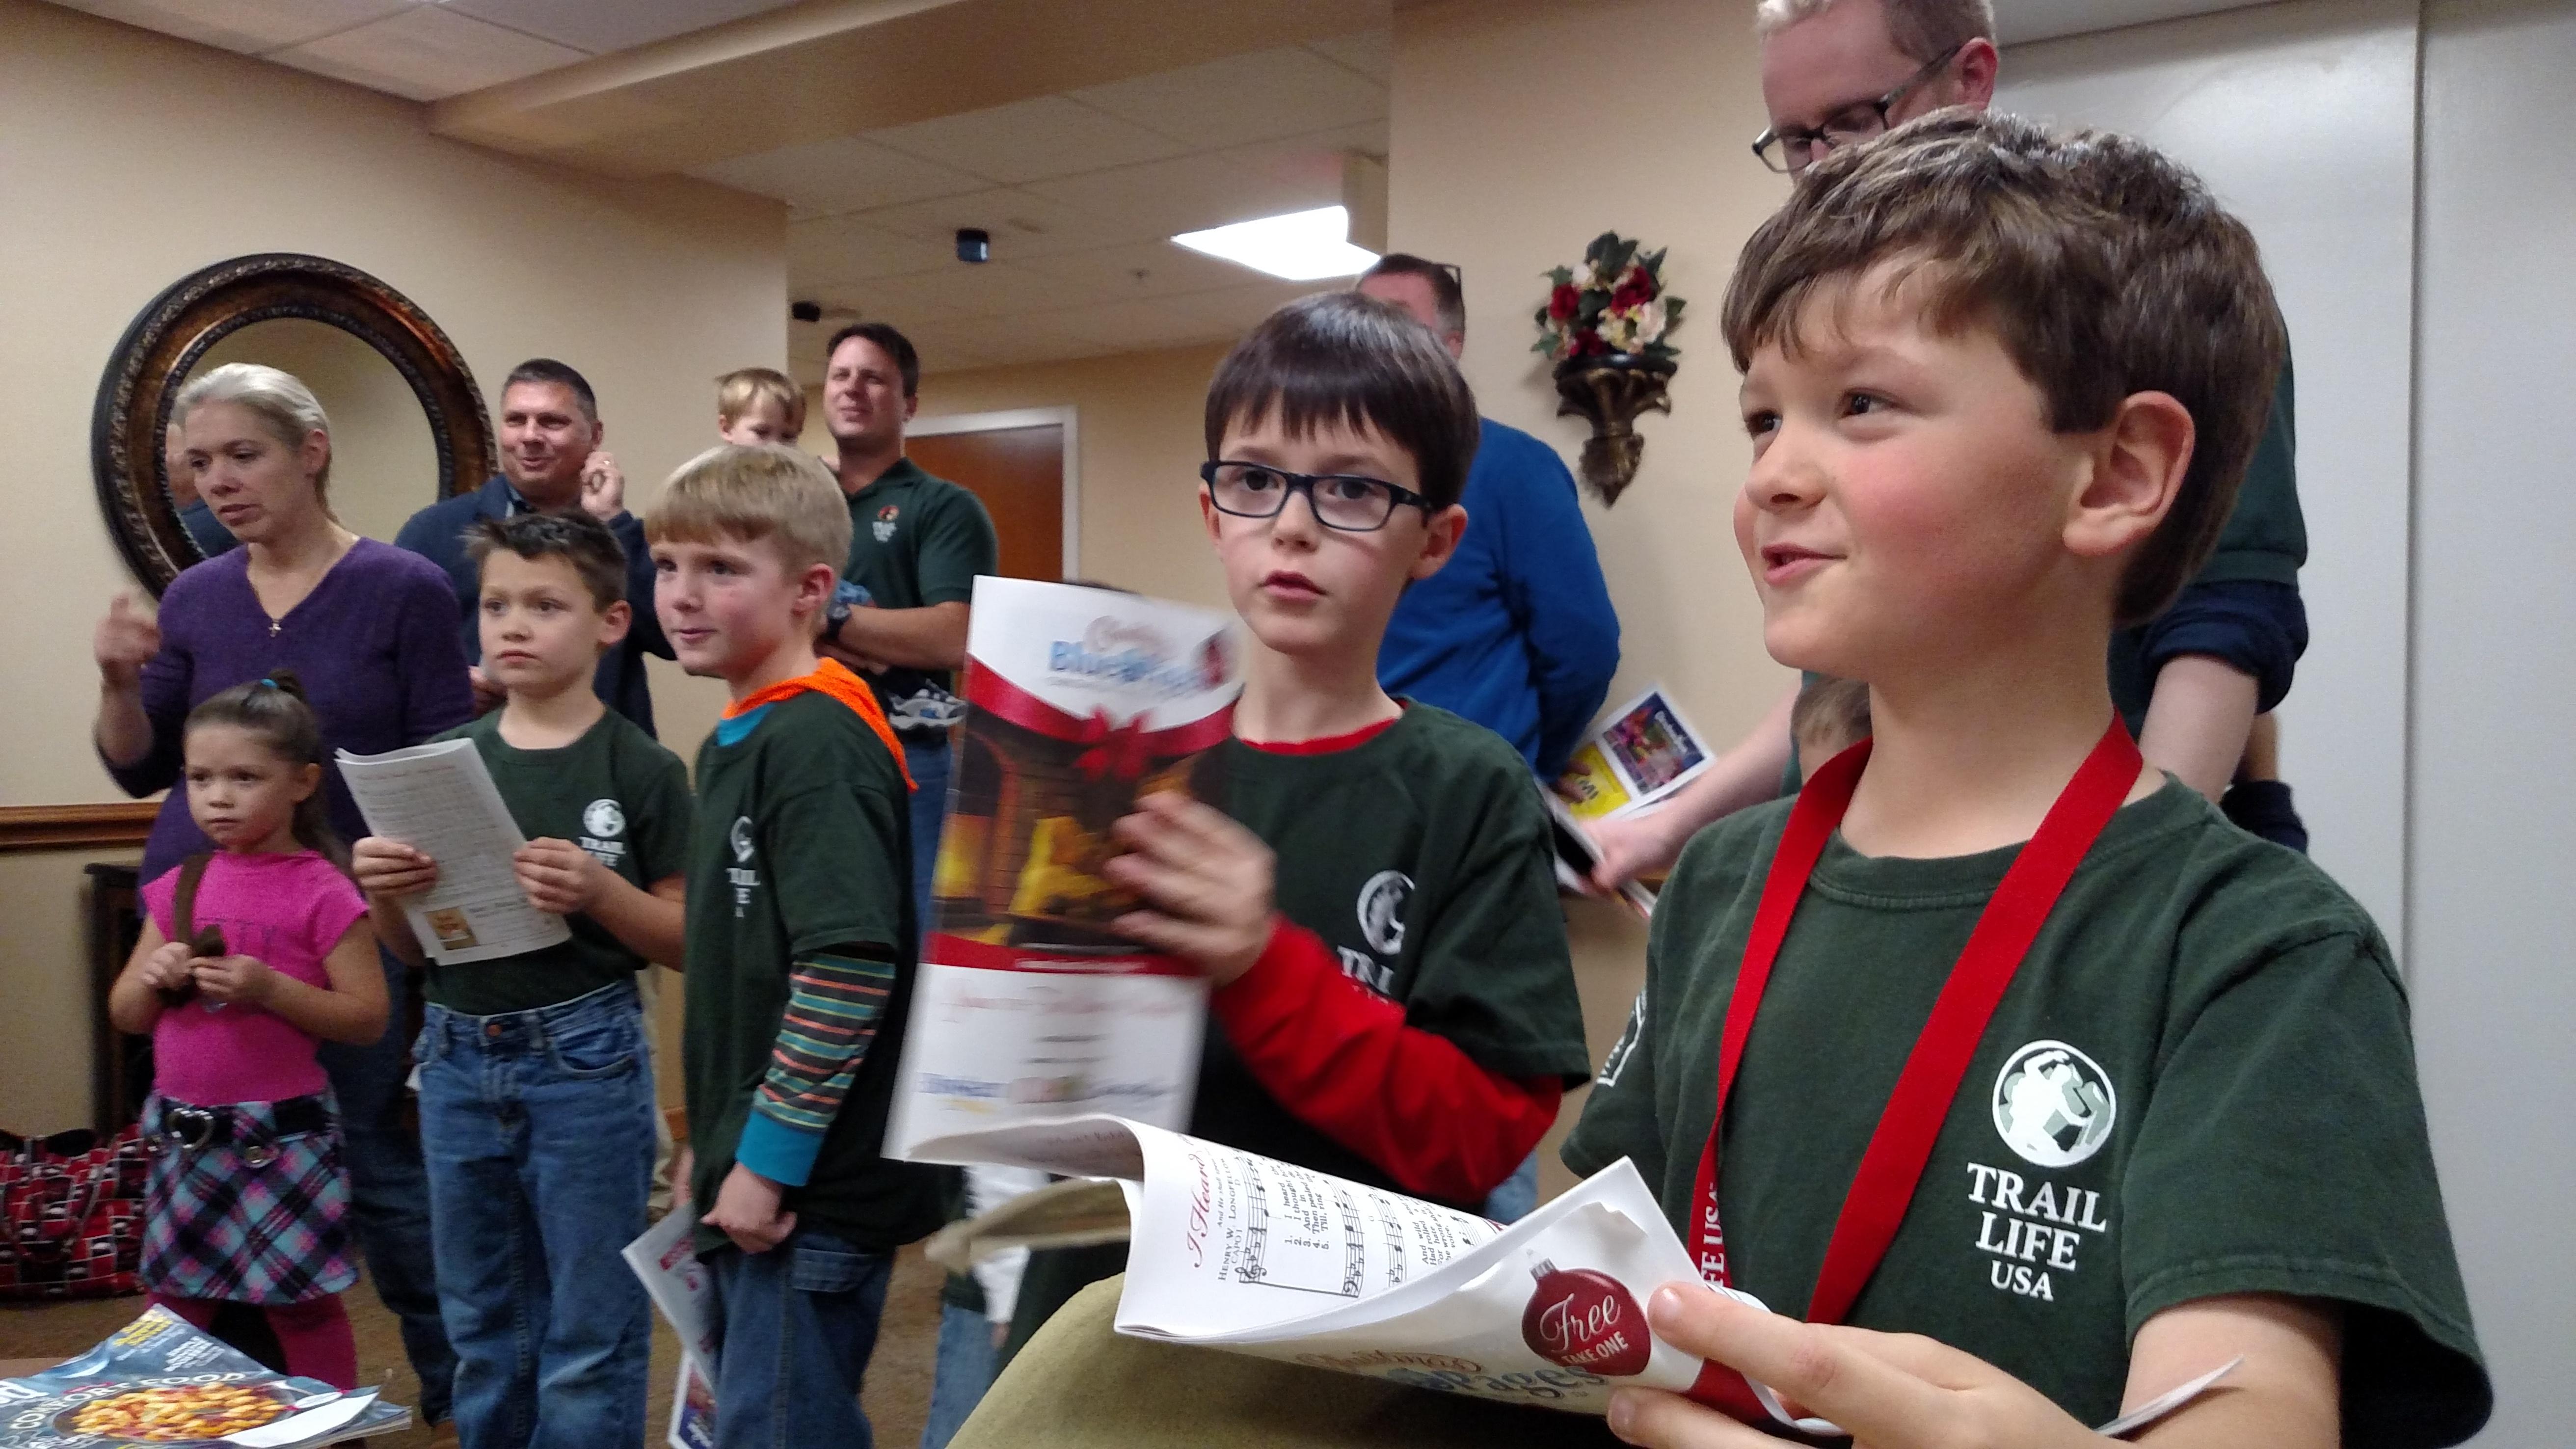 Christmas Events In Cincinnati 2019 Carol Cincinnati 2019   Trust Blue Review